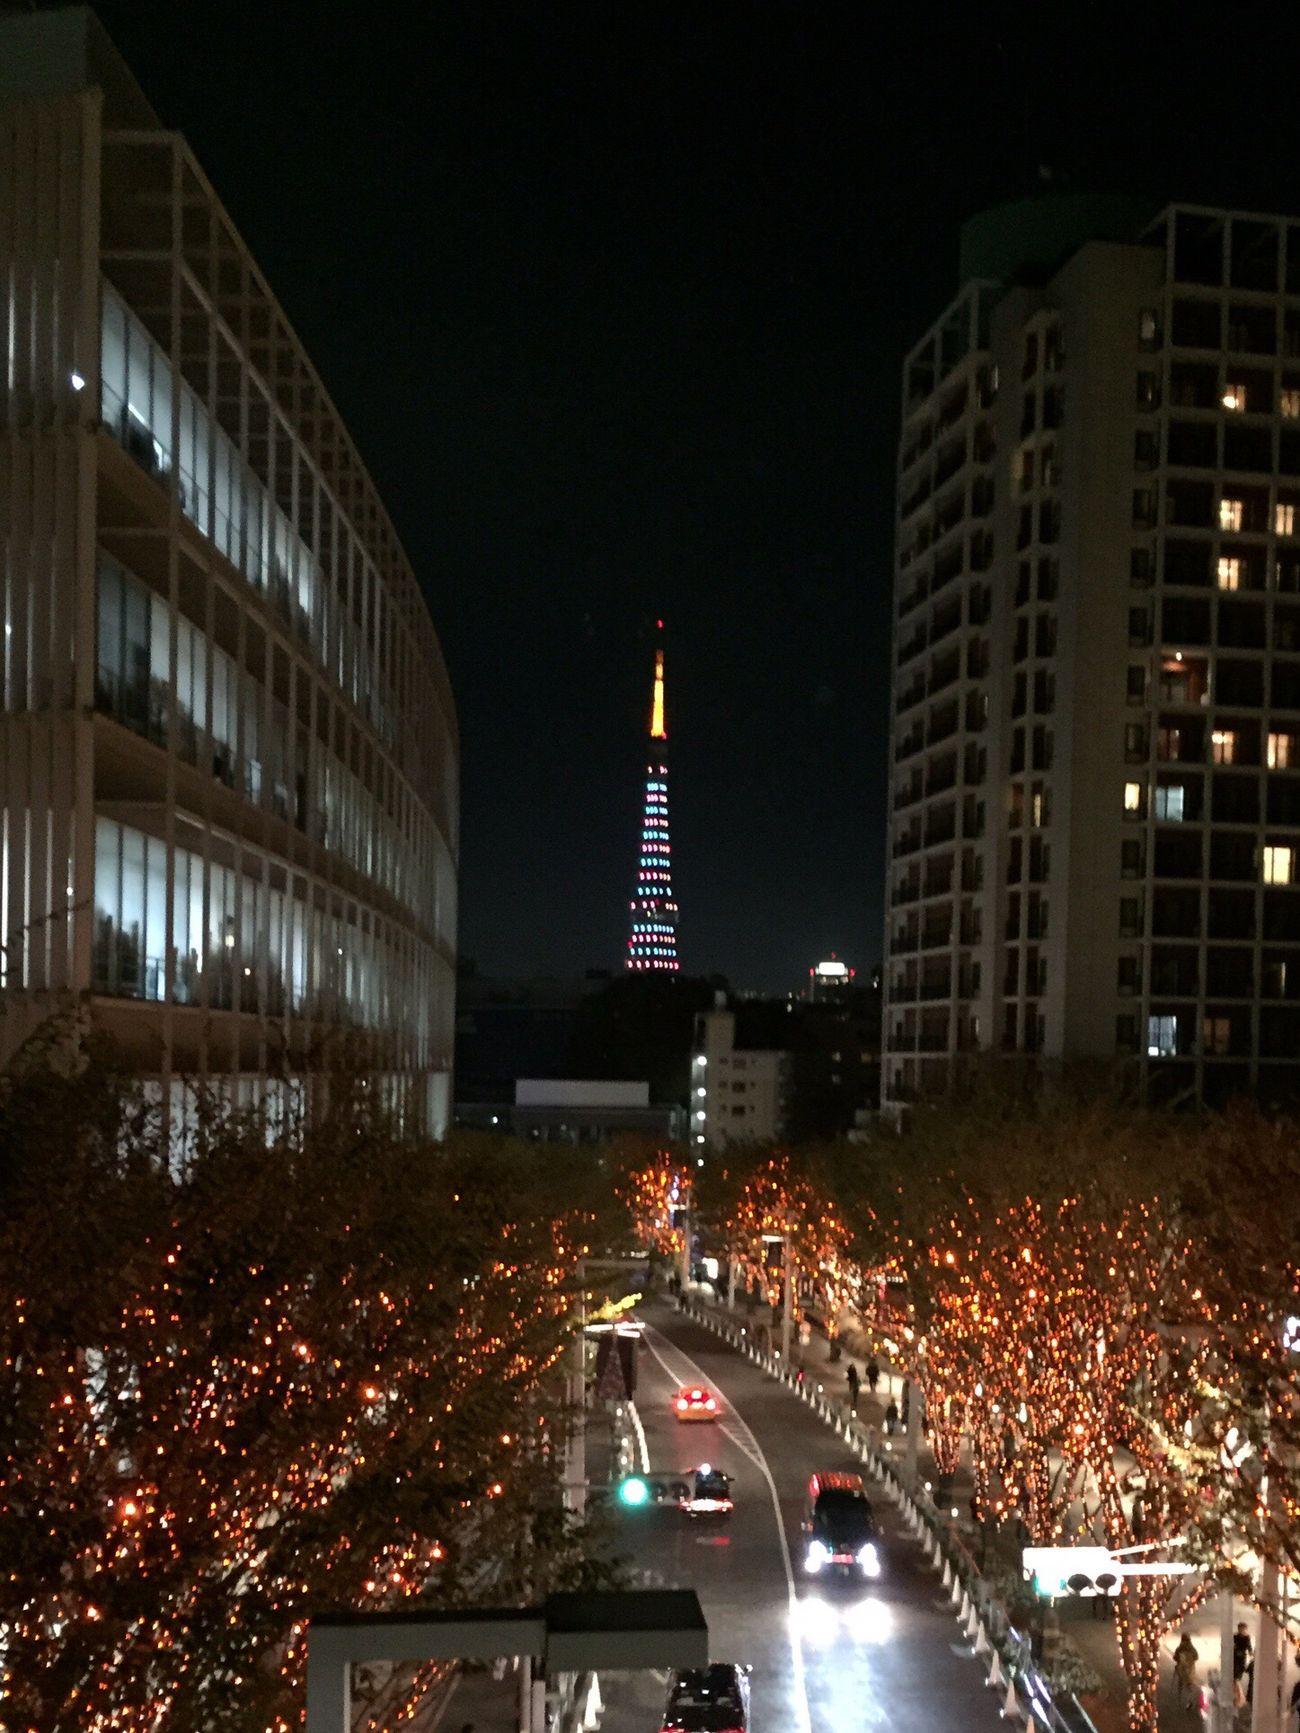 Illuminated Illumination Christmas Lights Christmas Decorations Tokyo Tower Roppongi Roppongihills Tokyo イルミネーション クリスマス 東京タワー Night 夜景 六本木 東京 六本木ヒルズ